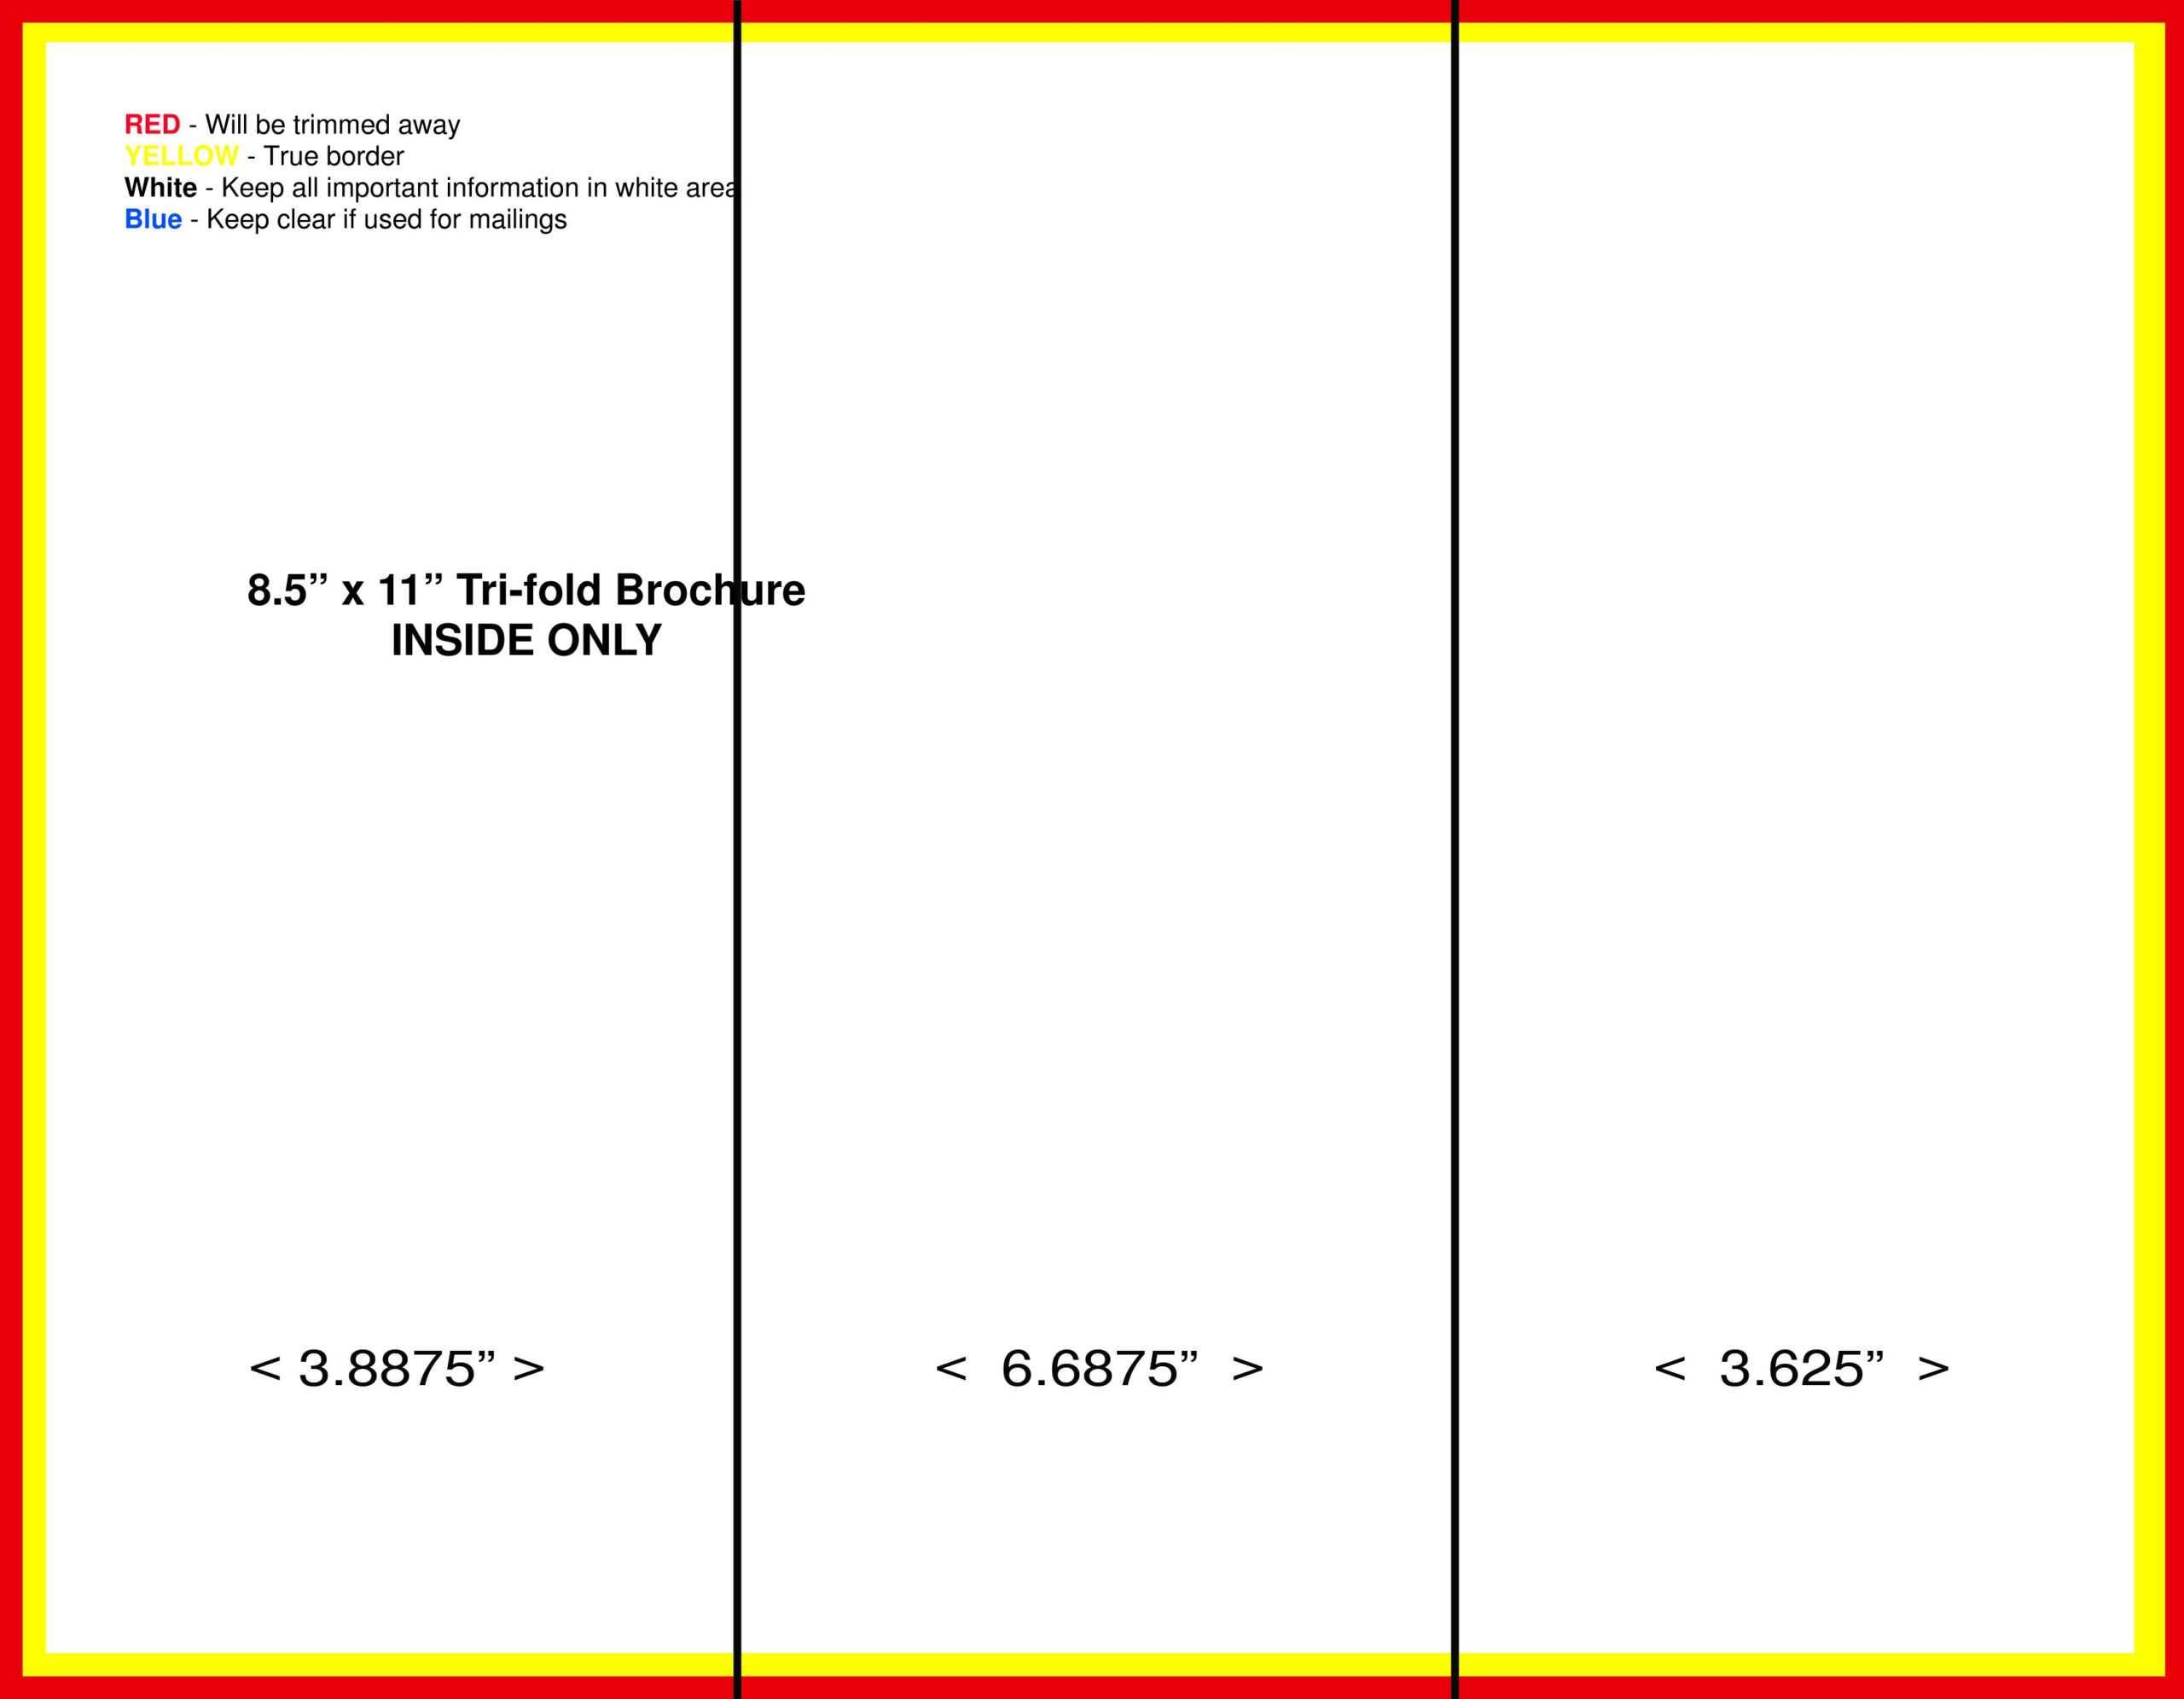 032 Tri Fold Brochure Template Download Ideas Trifold Regarding 6 Sided Brochure Template